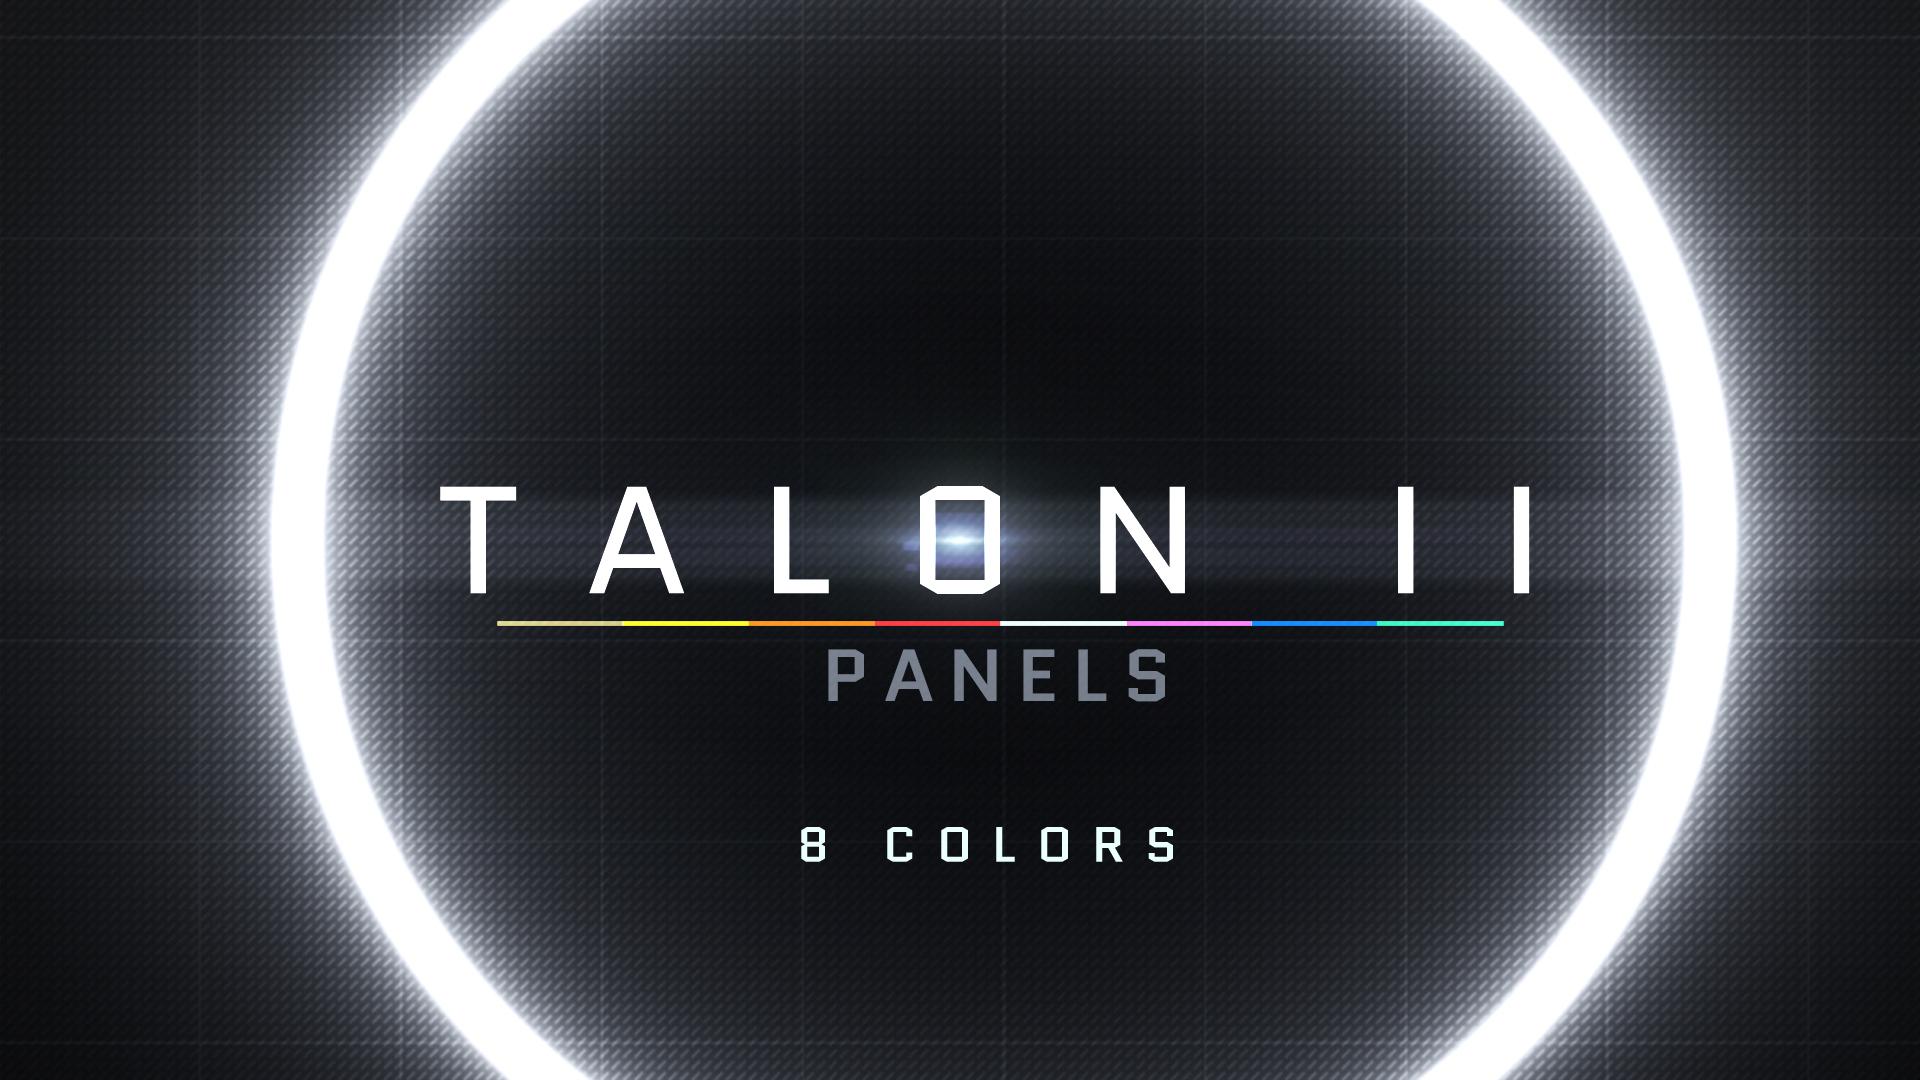 Talon II Panels